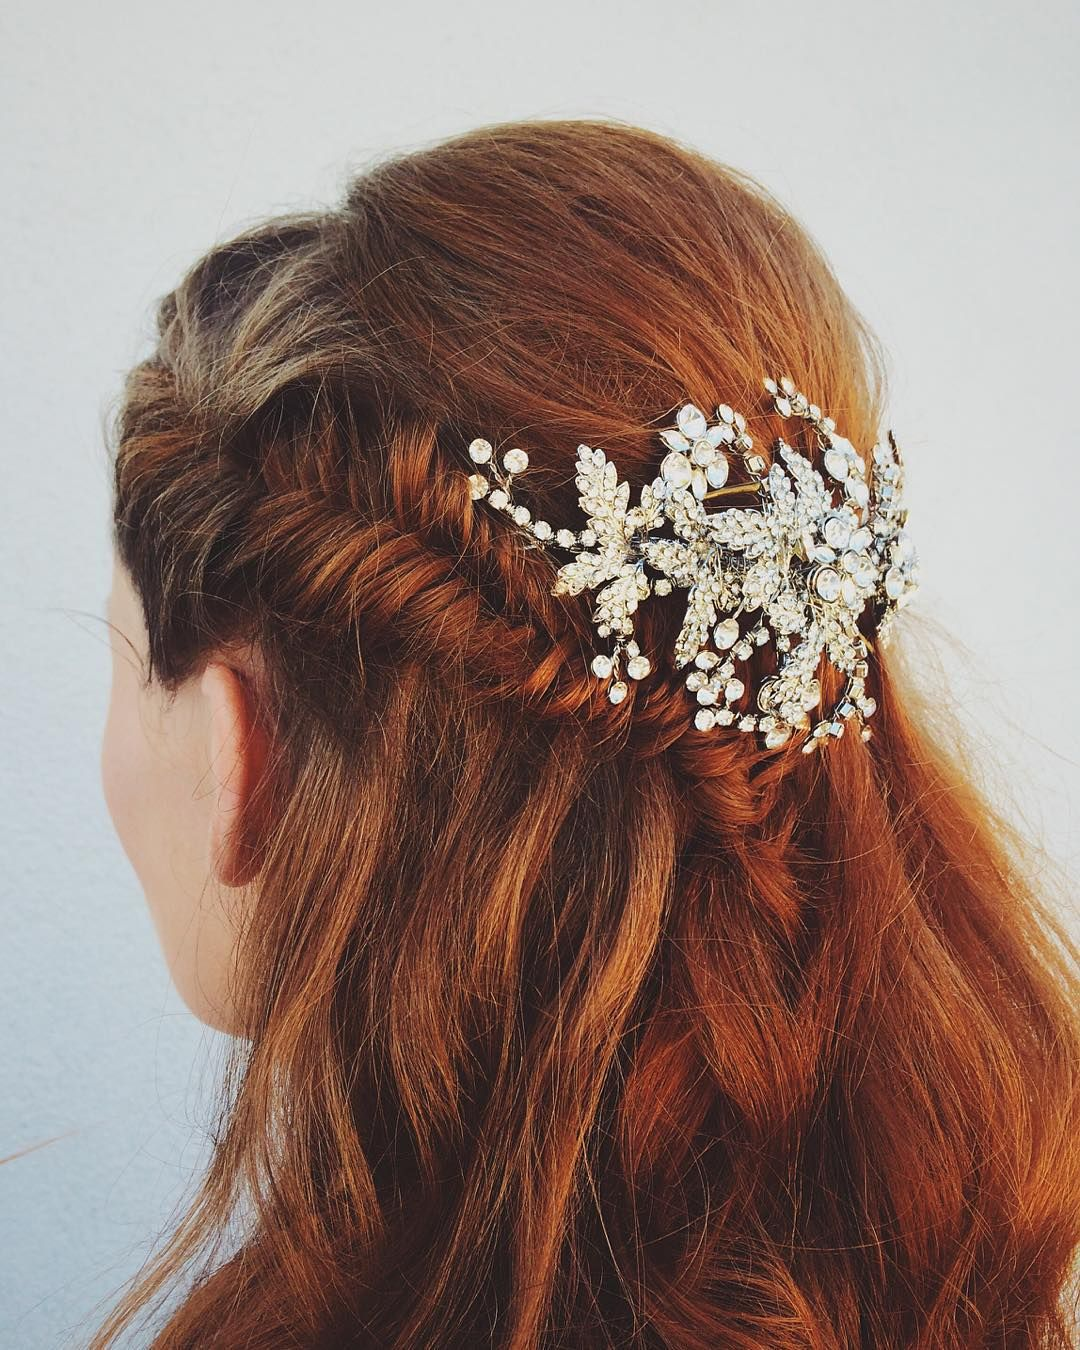 Wedding Entourage Hairstyle: Jen's Trial. #mobilebridalsalon #makeupandhair #married